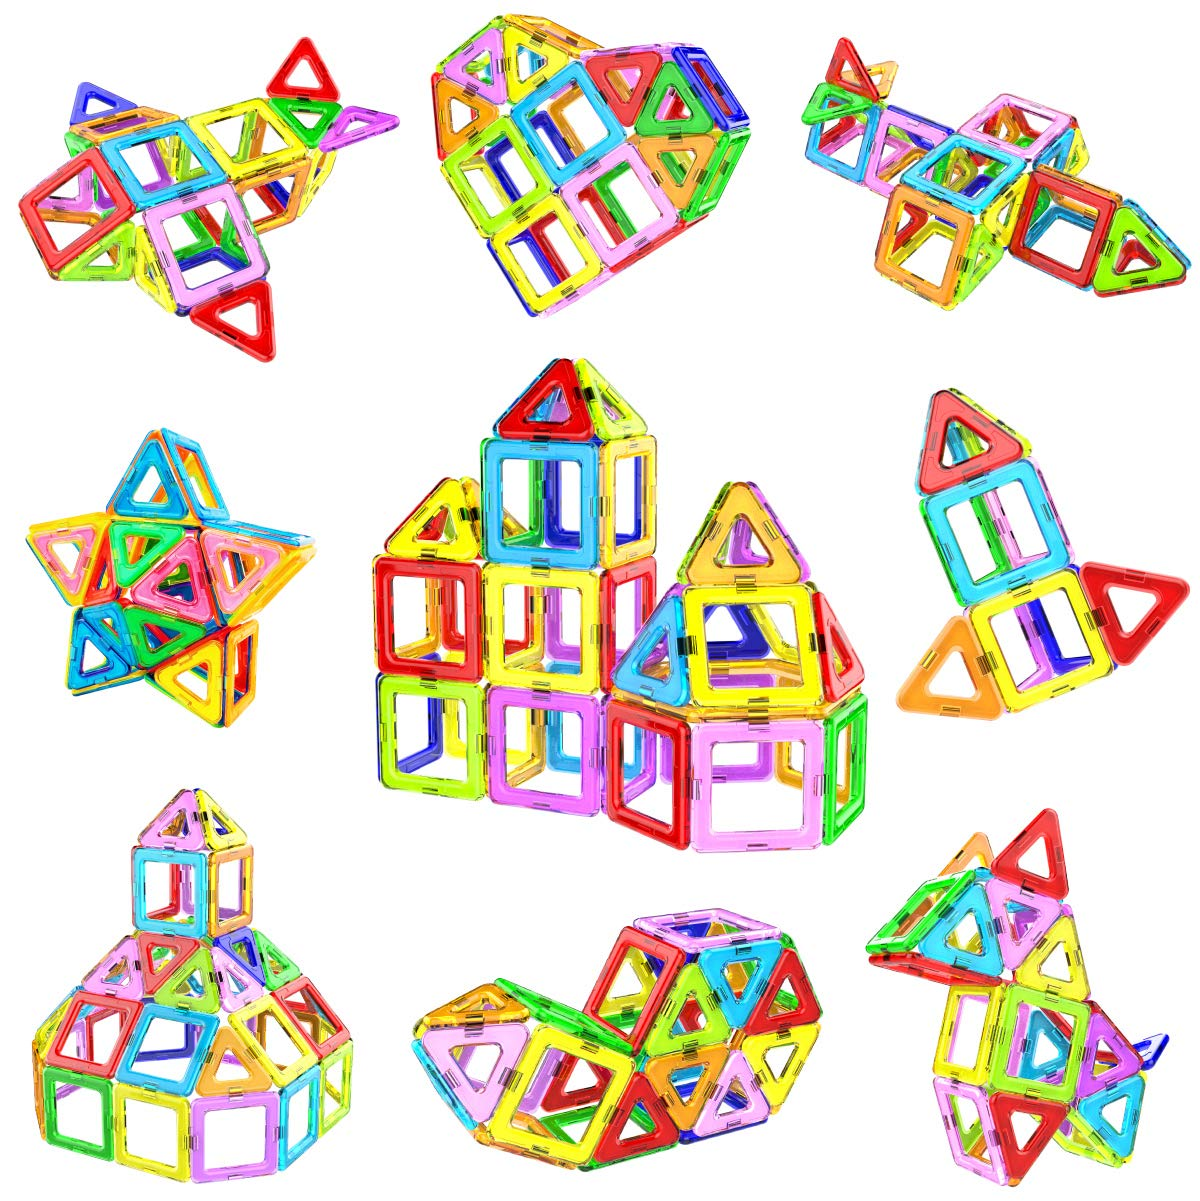 Jasonwell 68 Pcs Magnetic Tiles Building Blocks Set for Boys Girls Preschool Educational Construction Kit Magnet Stacking Toys for Kids Toddlers Children Age 3 4 5 6 7 8 Year Old ... by Jasonwell